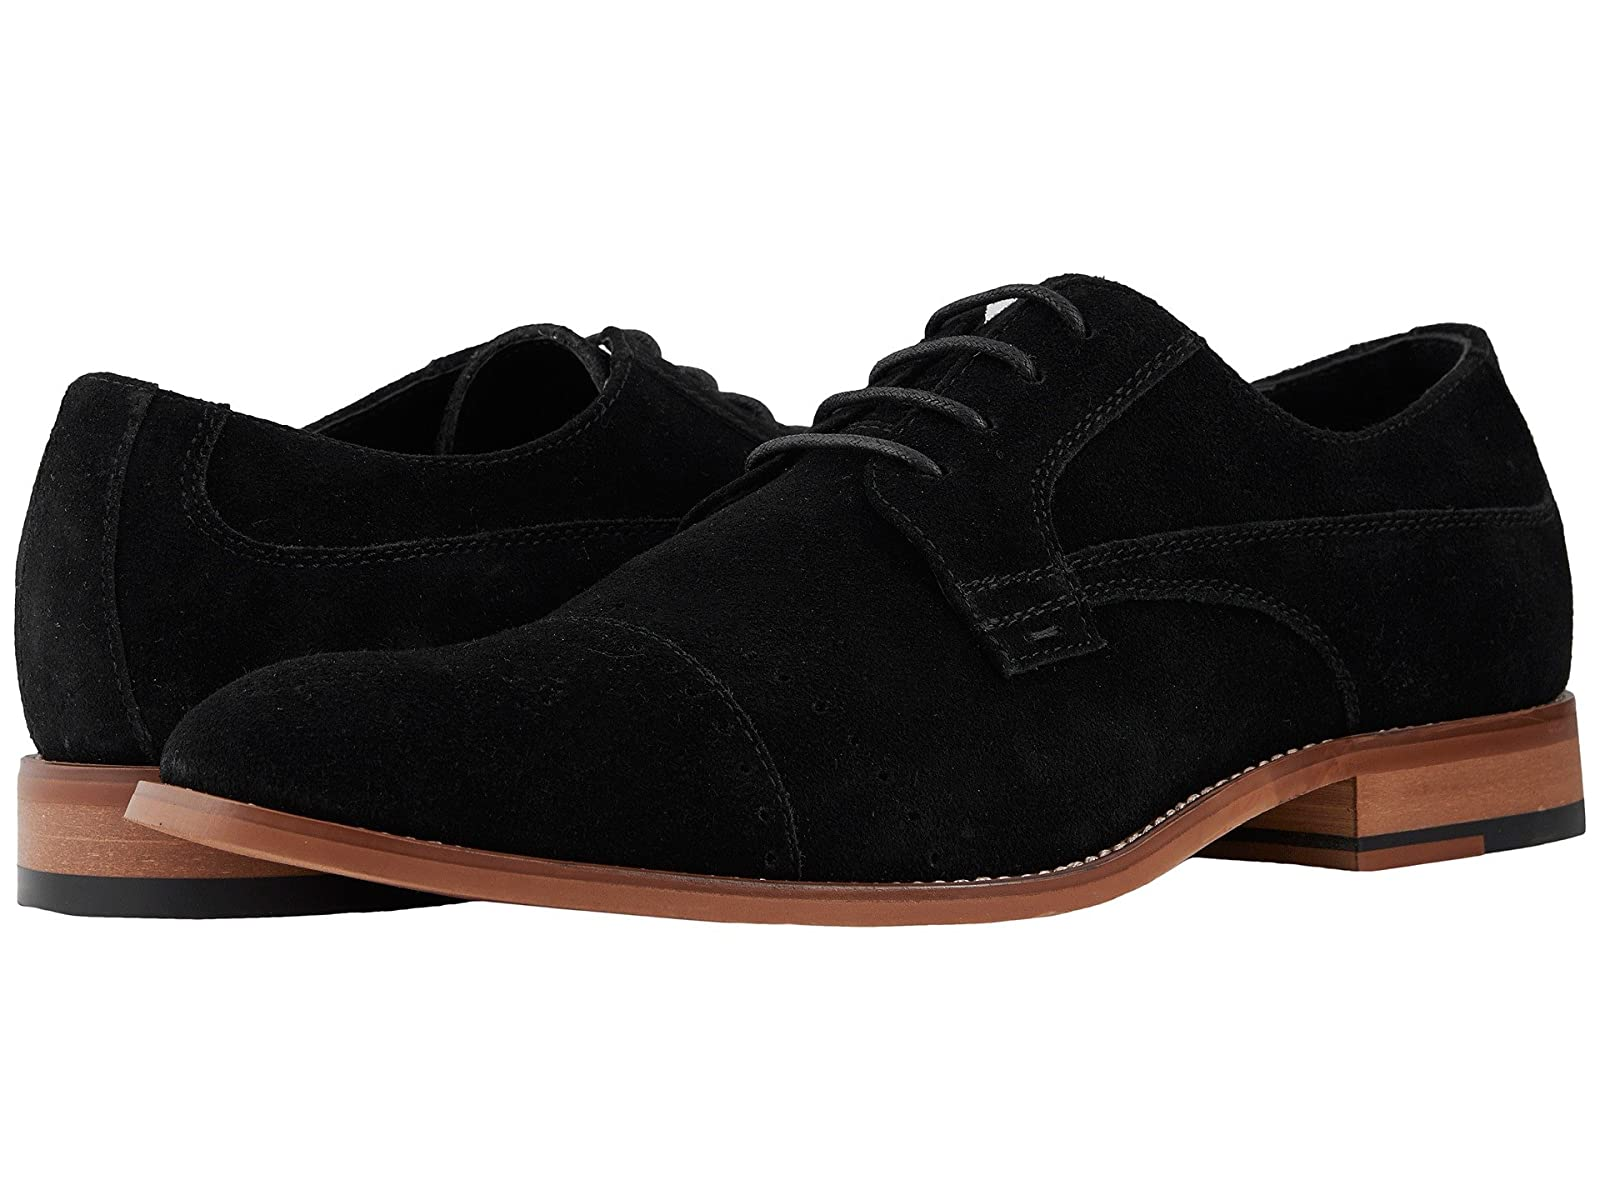 Stacy Adams DeaconAtmospheric grades have affordable shoes